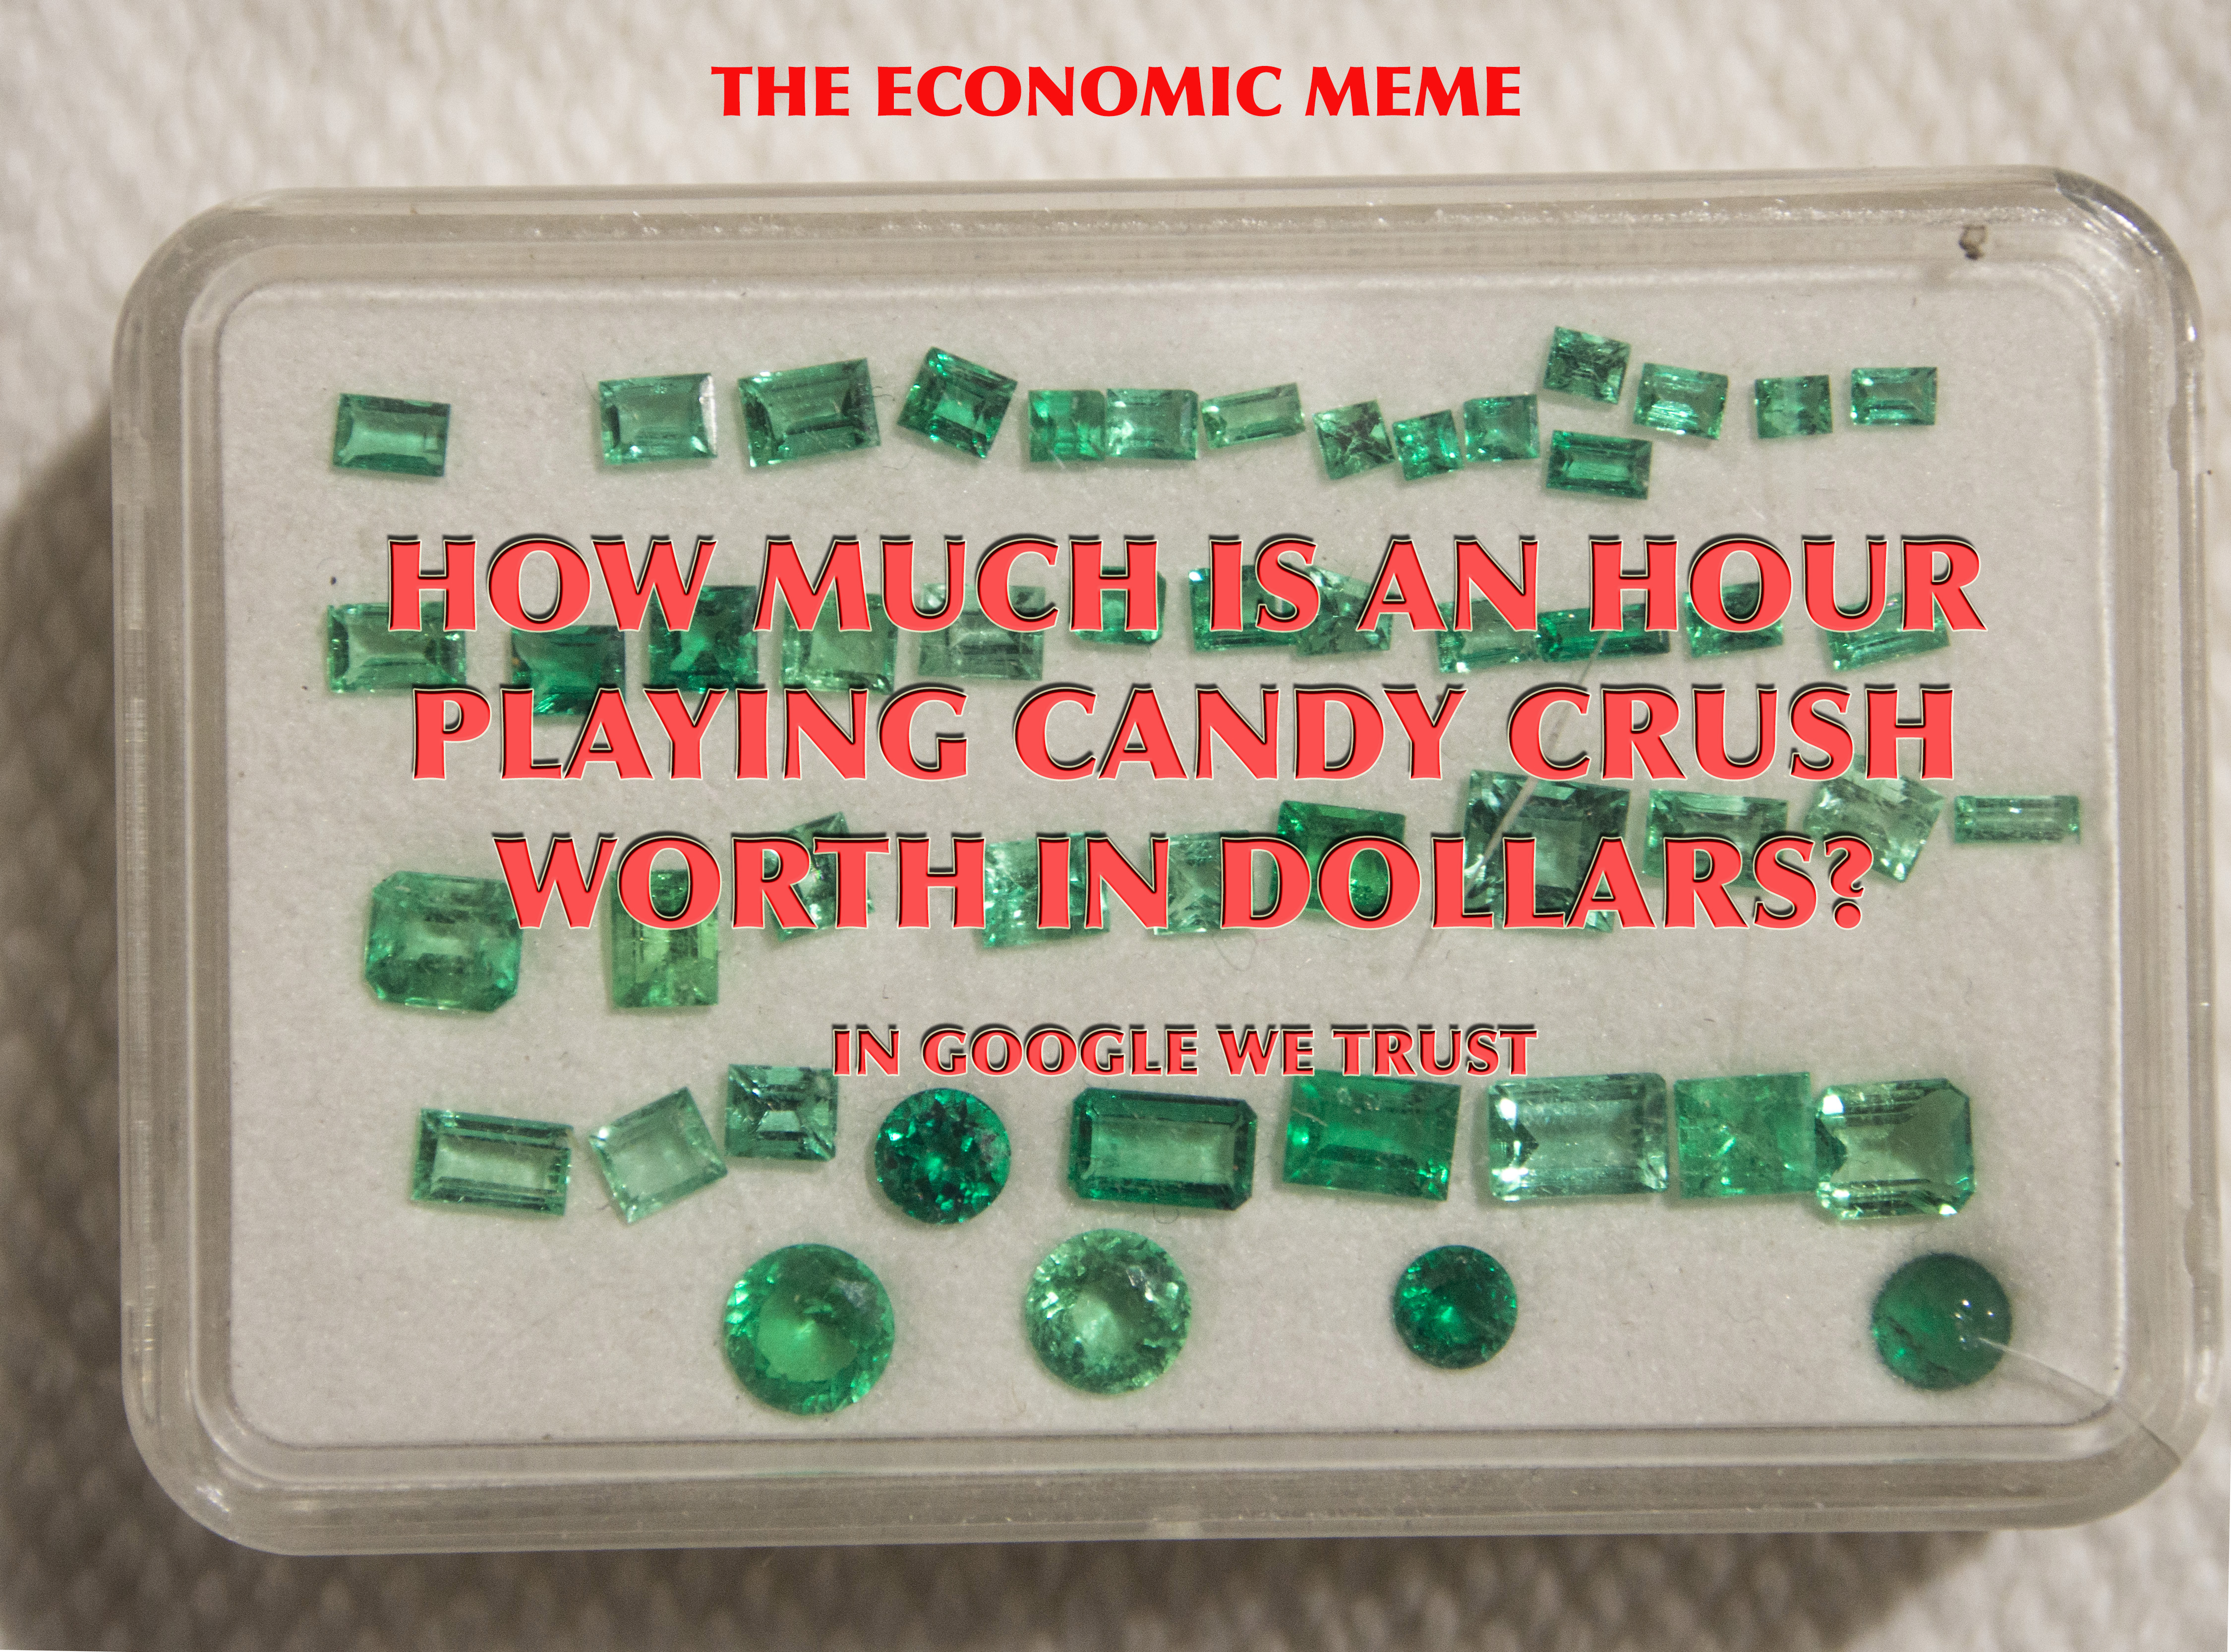 CANDY CRUSH wage